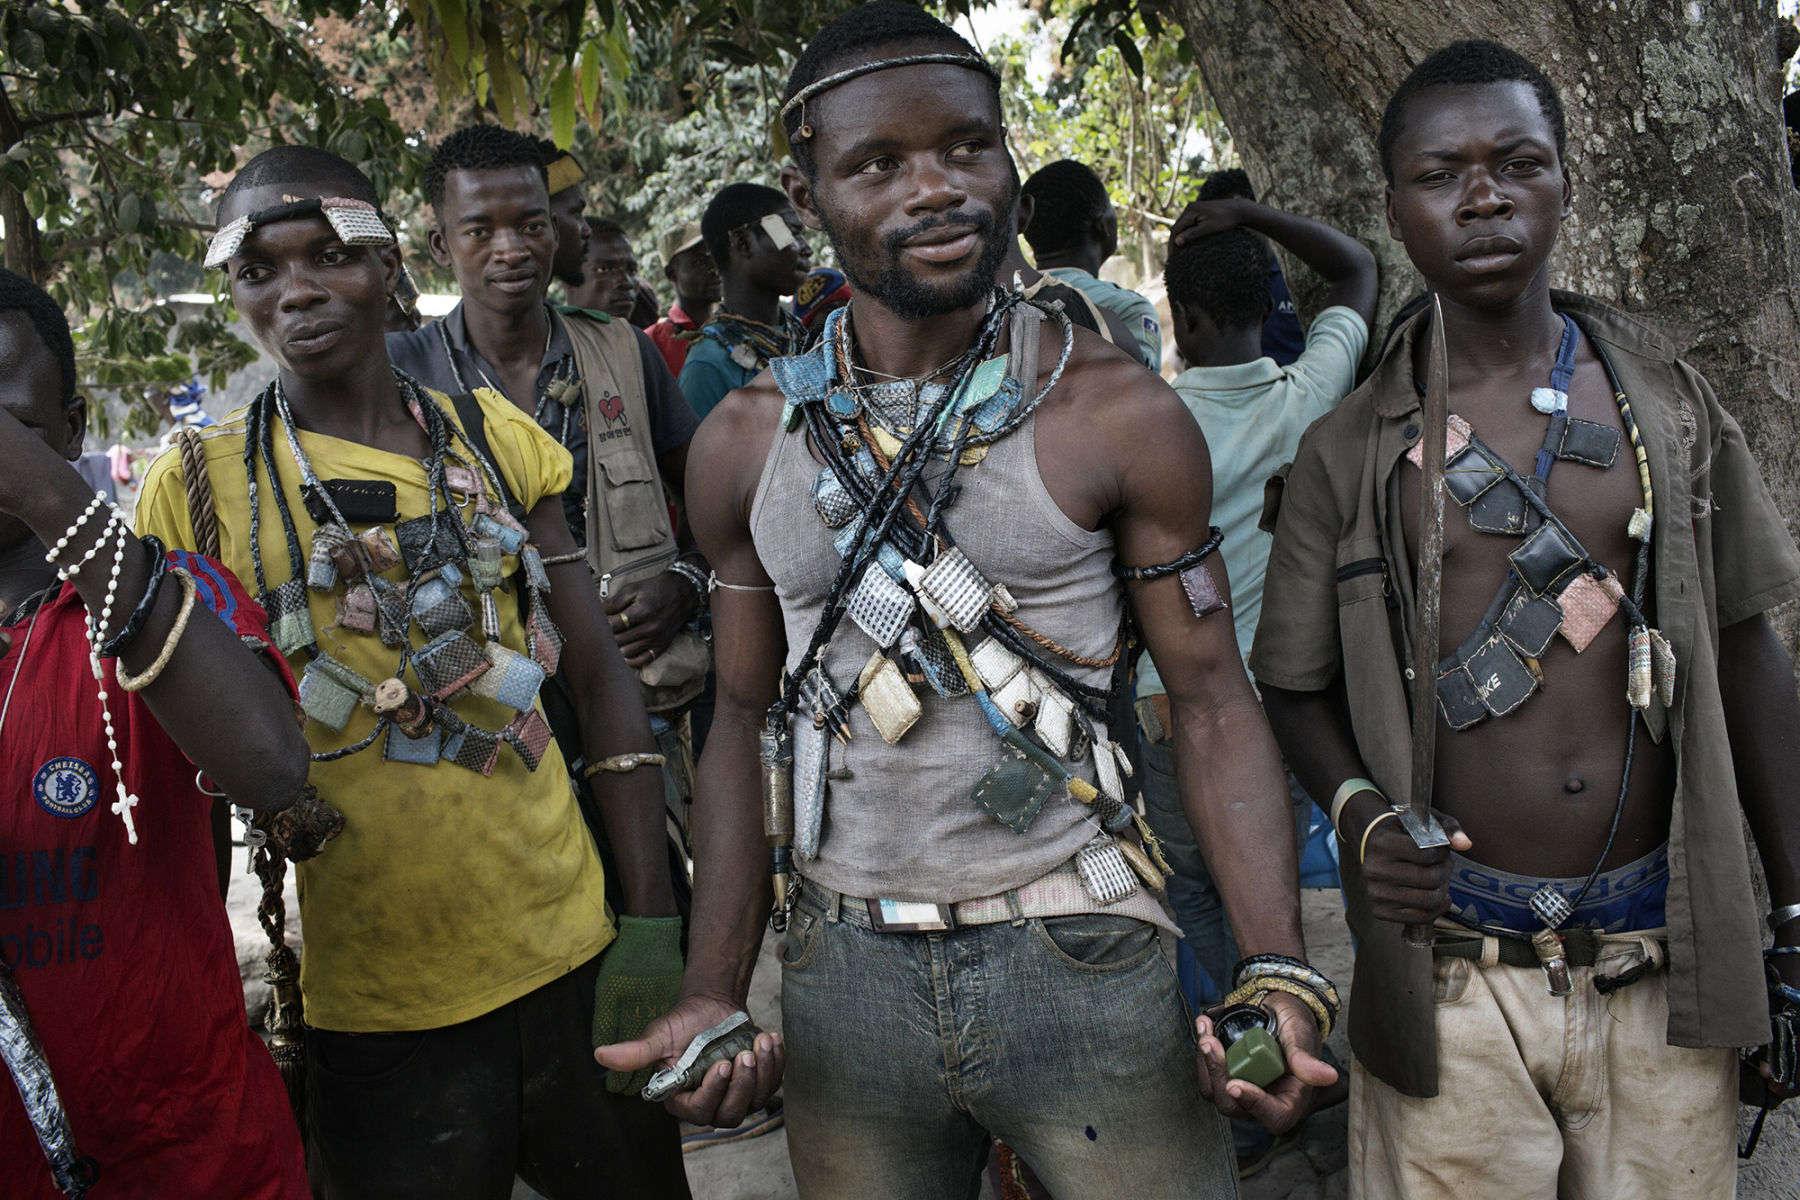 After the Seleka